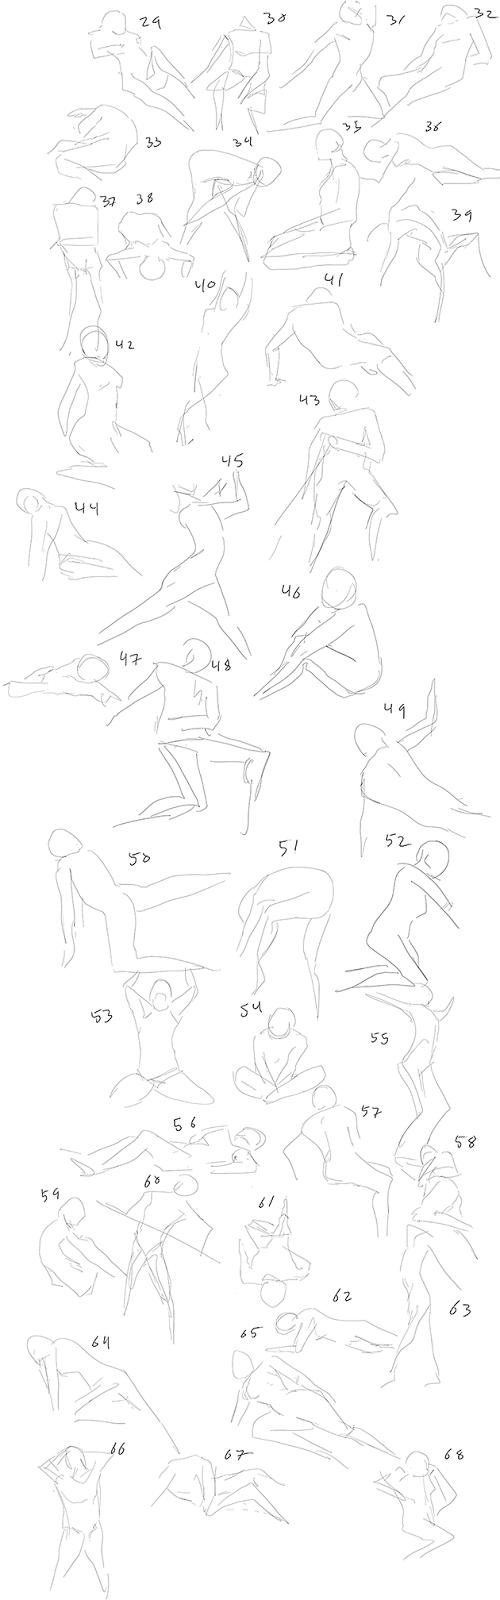 [Image: Gestures_17.png]